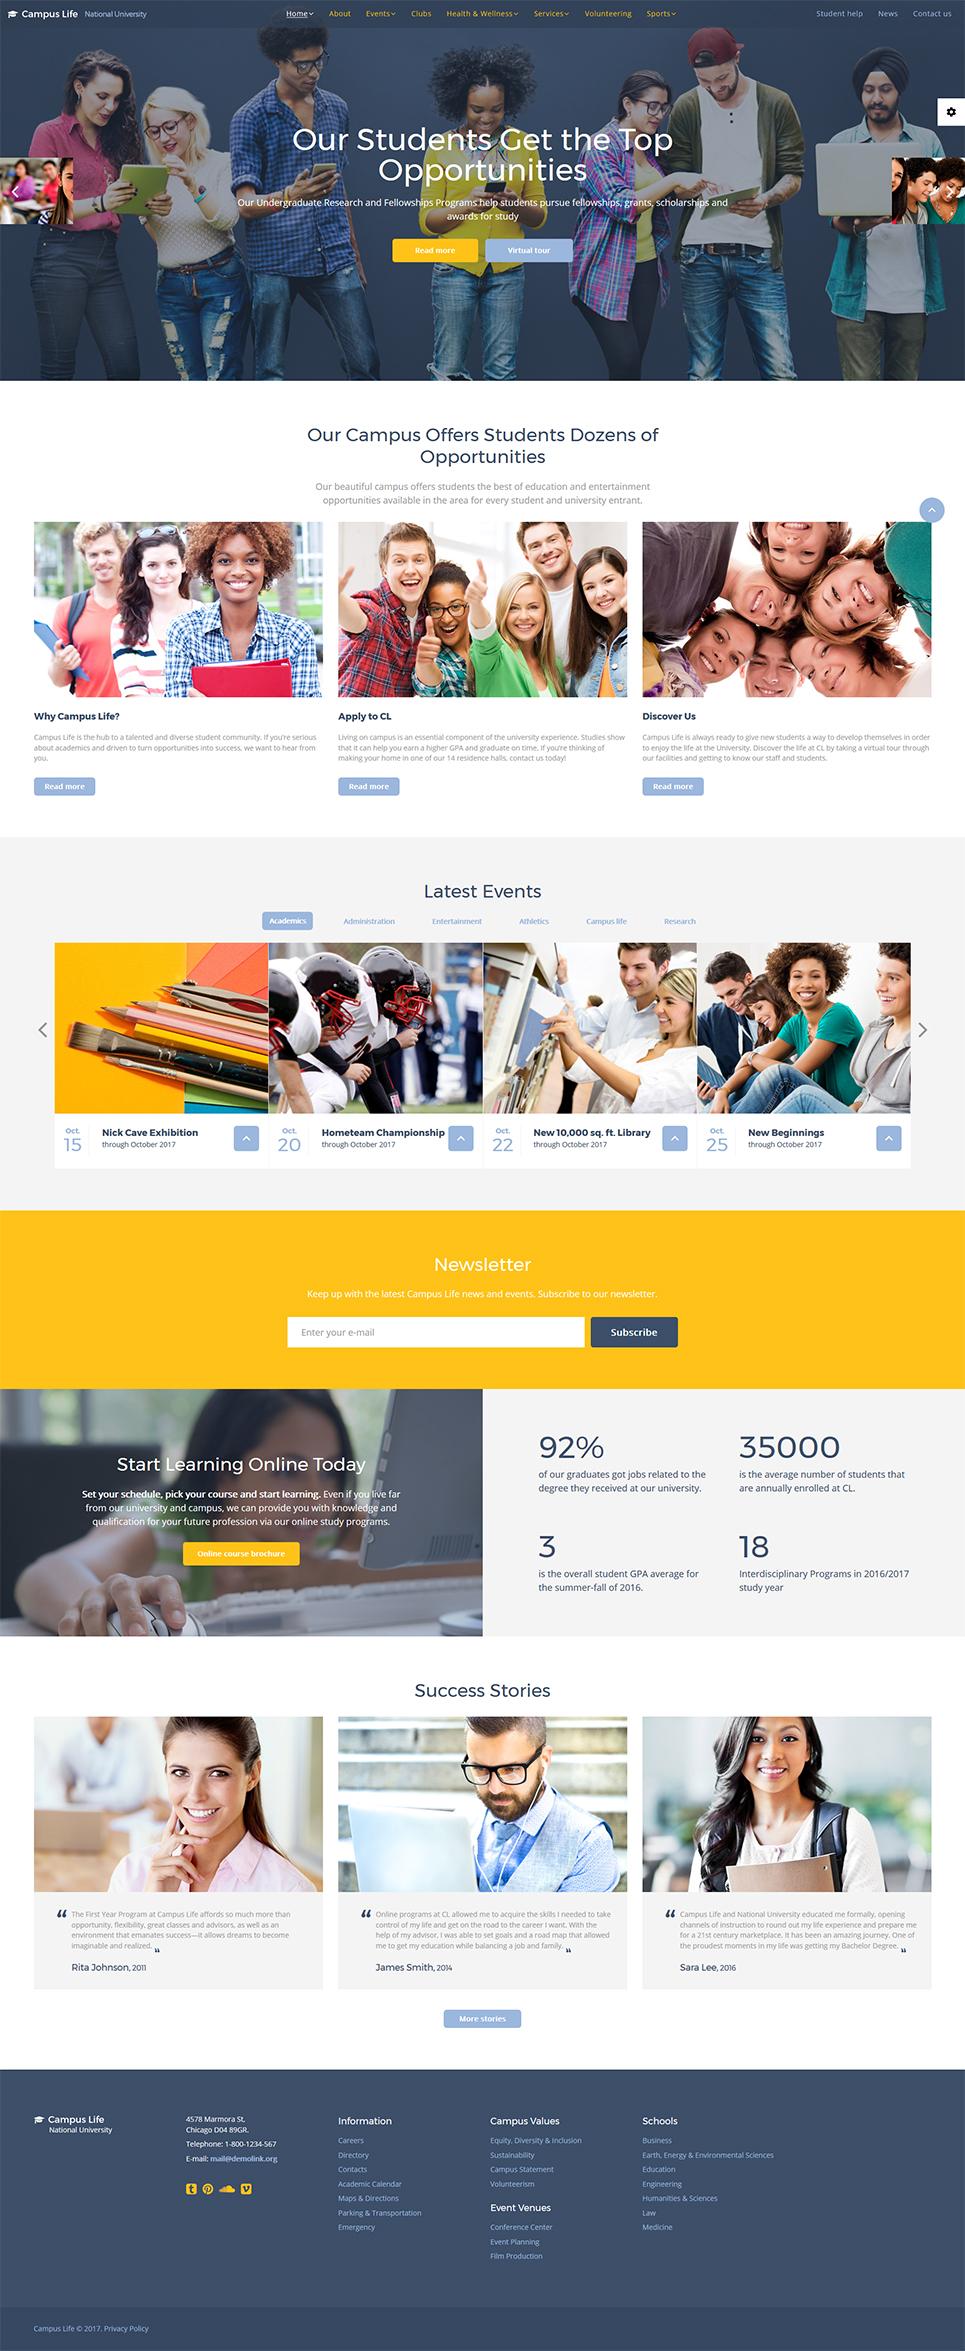 Reszponzív Campus Life - National University Multipage Weboldal sablon 61281